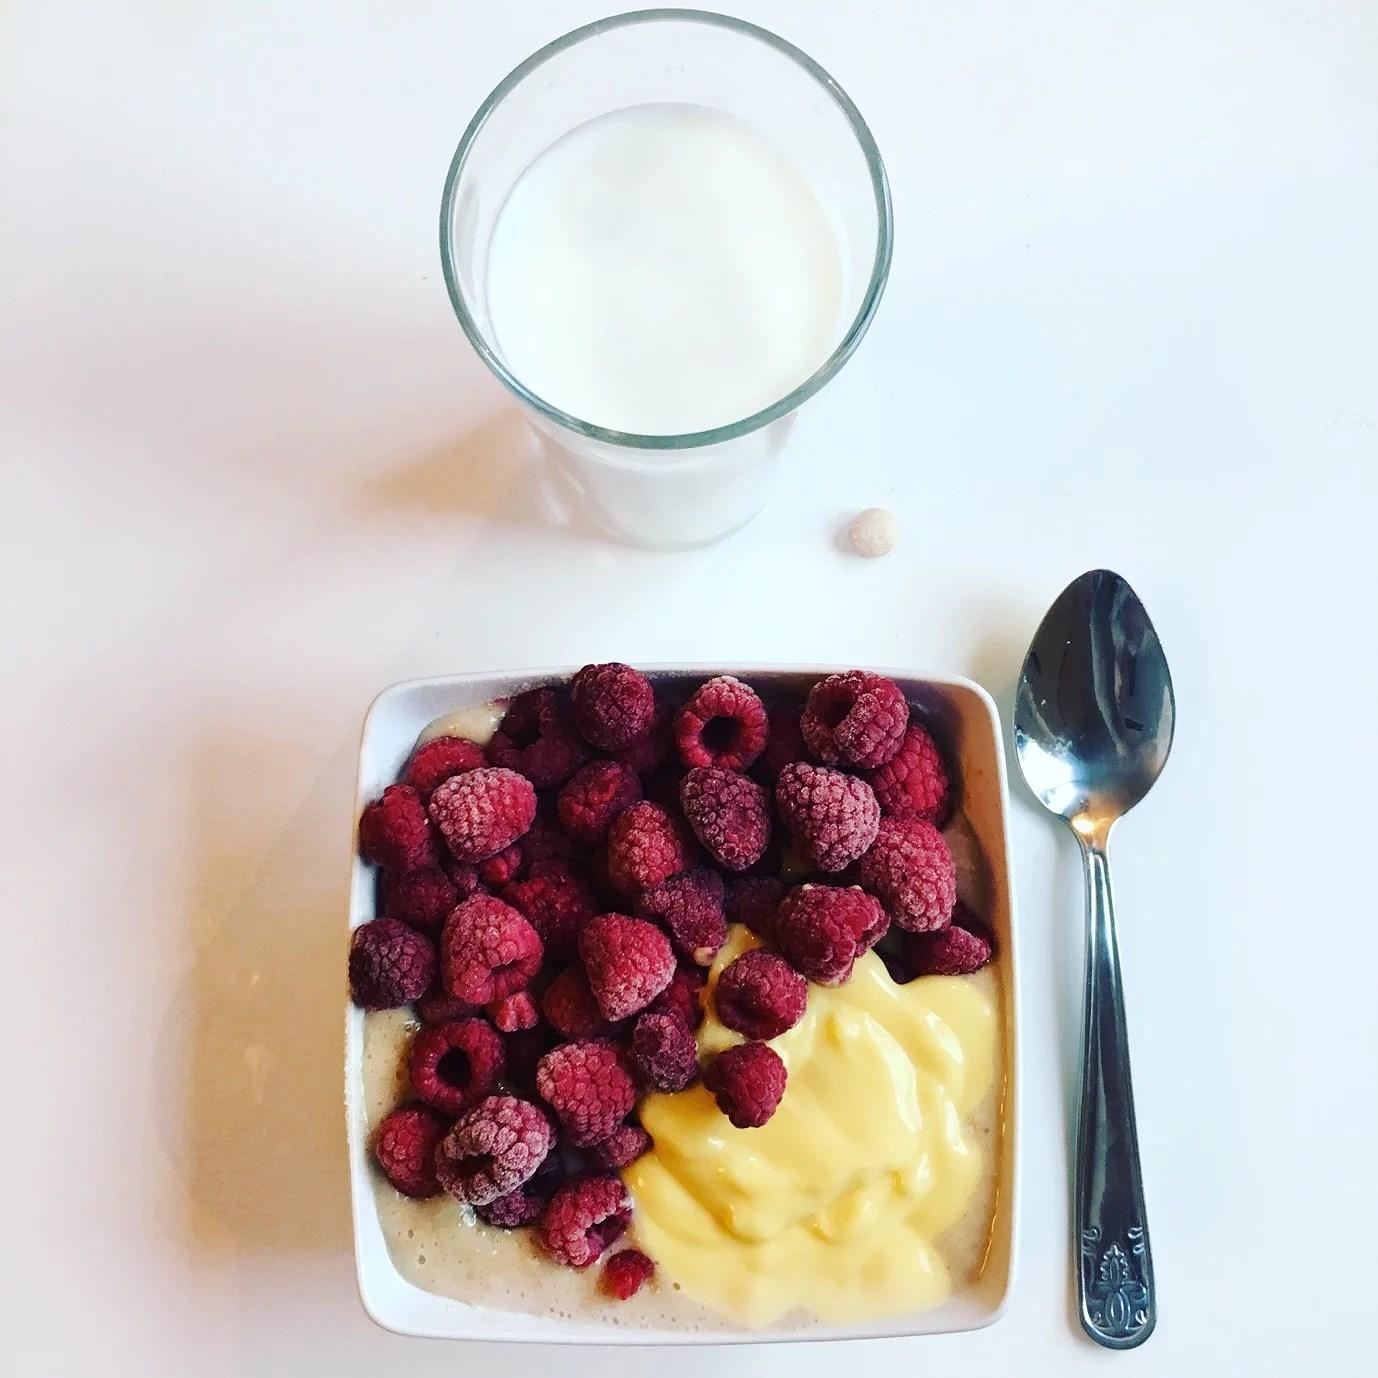 Proteingröt - Hur gör man?